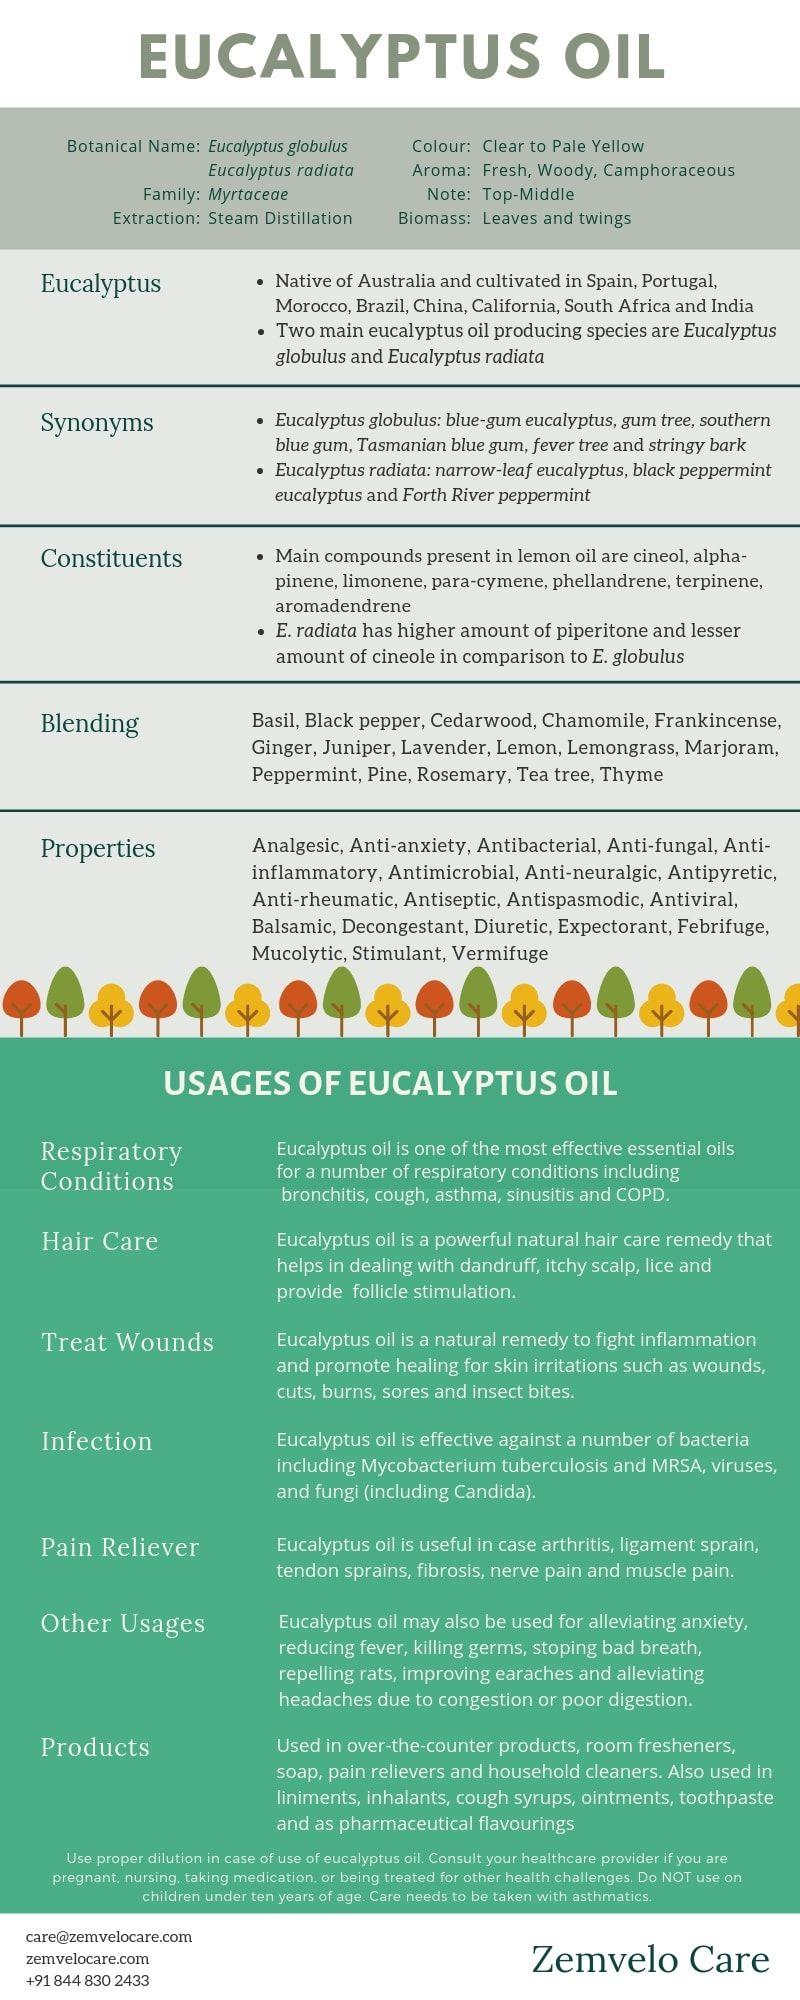 Eucalyptus Oil Guide Benefits Properties Characteristics Composition In 2020 Eucalyptus Oil Eucalyptus Essential Oil Uses Essential Oils Guide